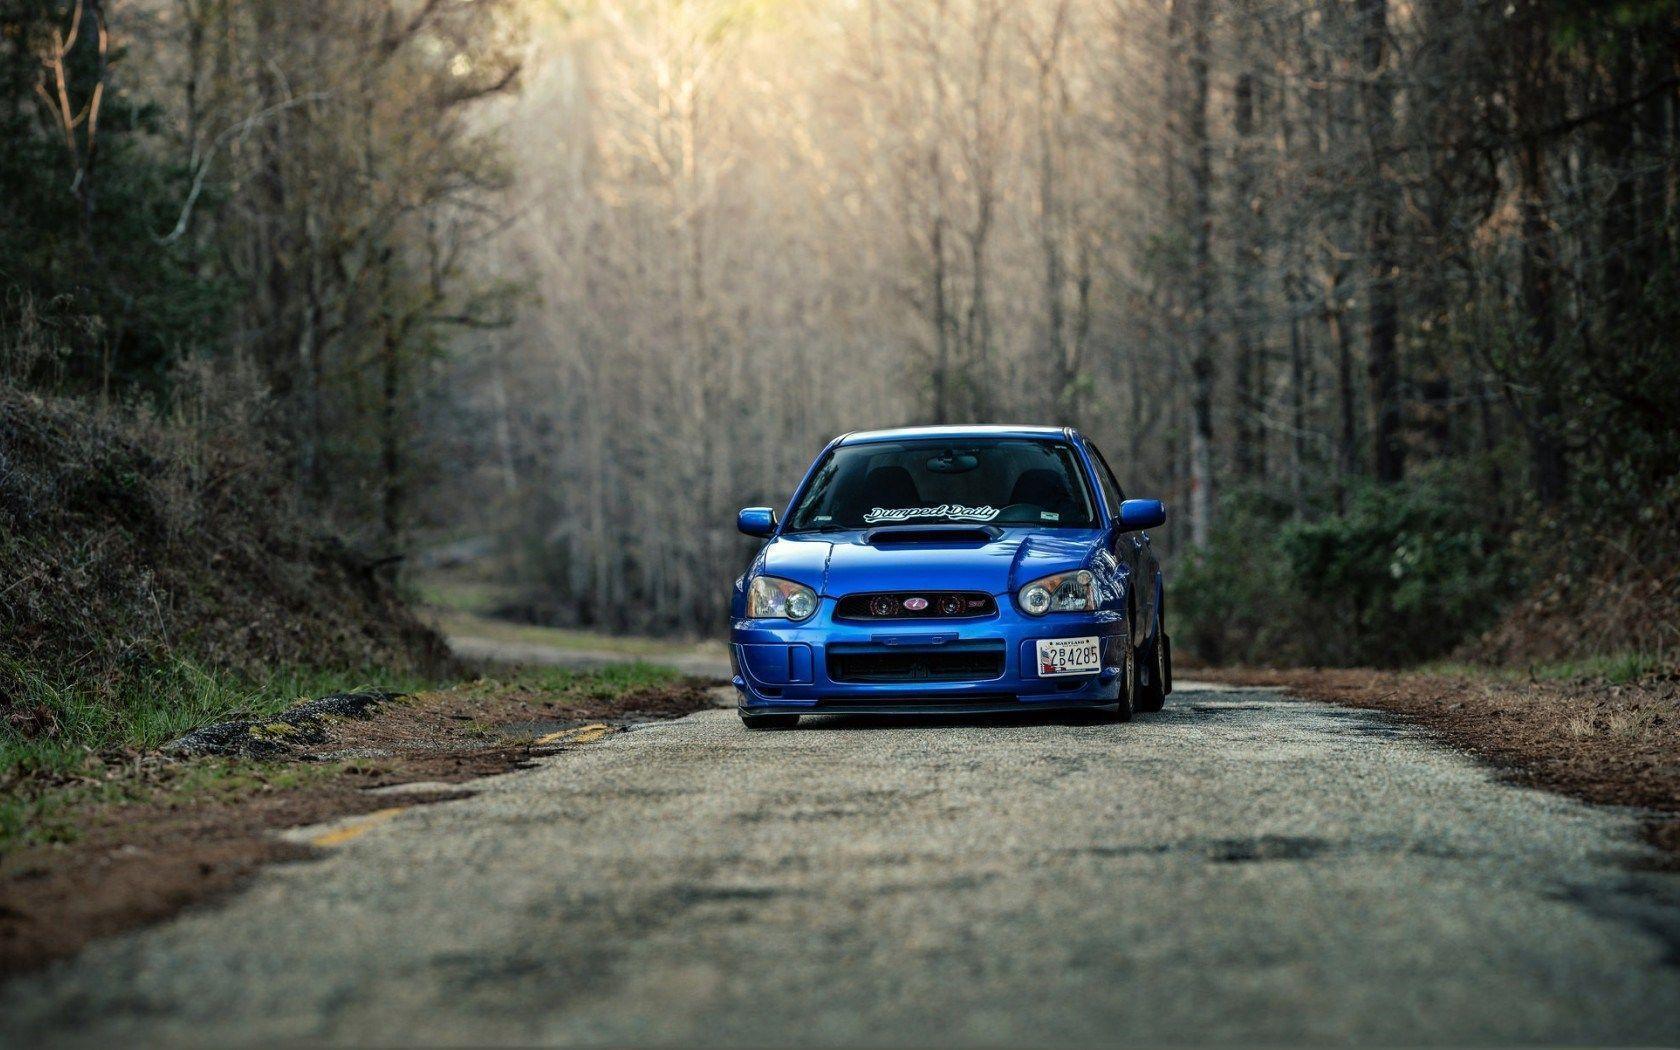 subaru hd car wallpapers - photo #42